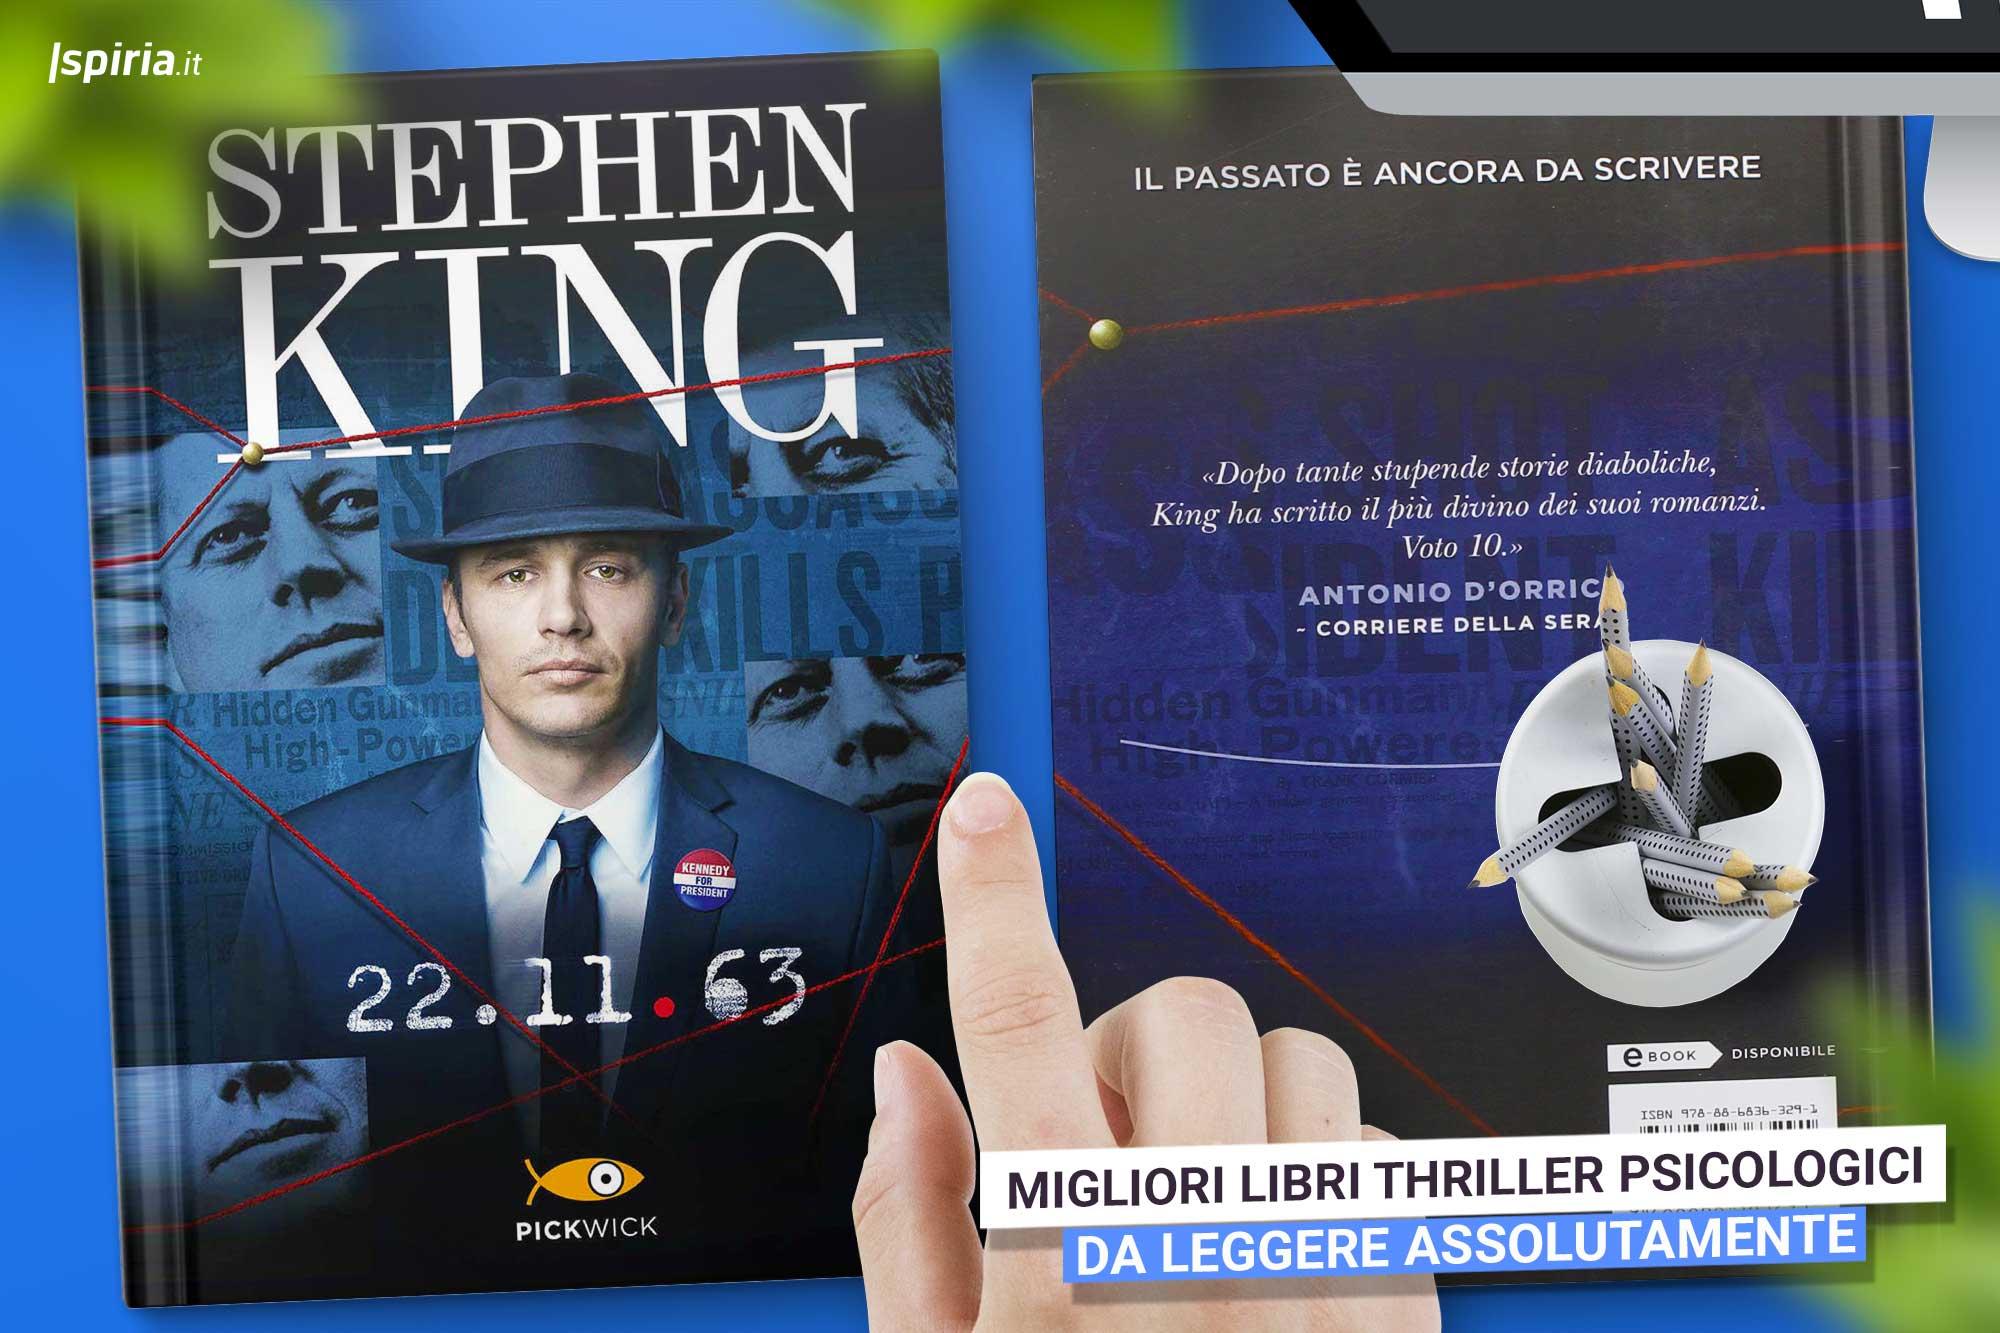 migliori-libri-thriller-psicologici